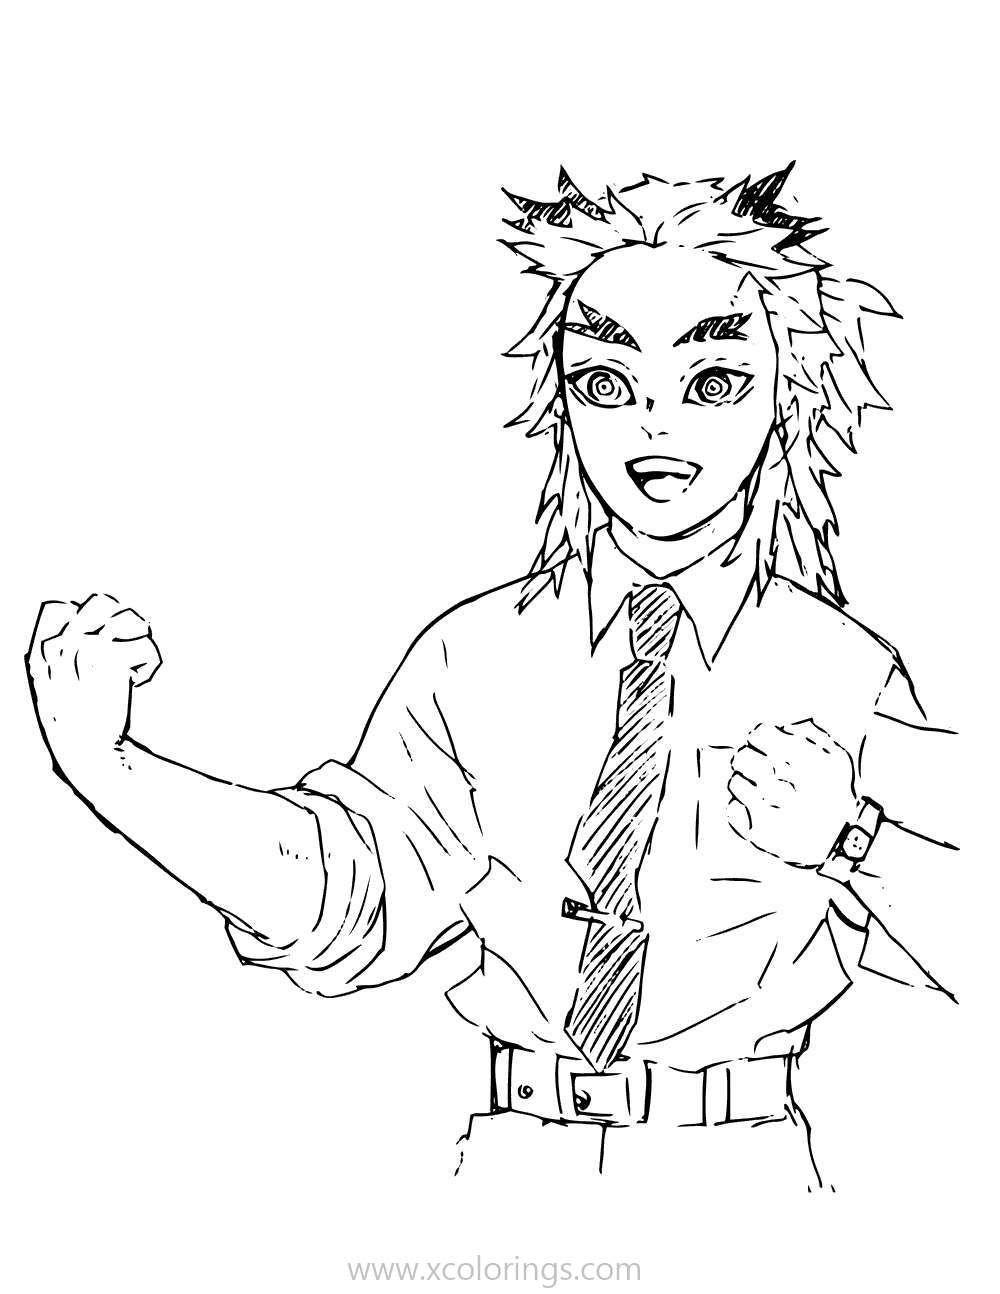 Demon Slayer Coloring Pages Kyojuro Rengoku Coloring Pages For Kids Slayer Demon